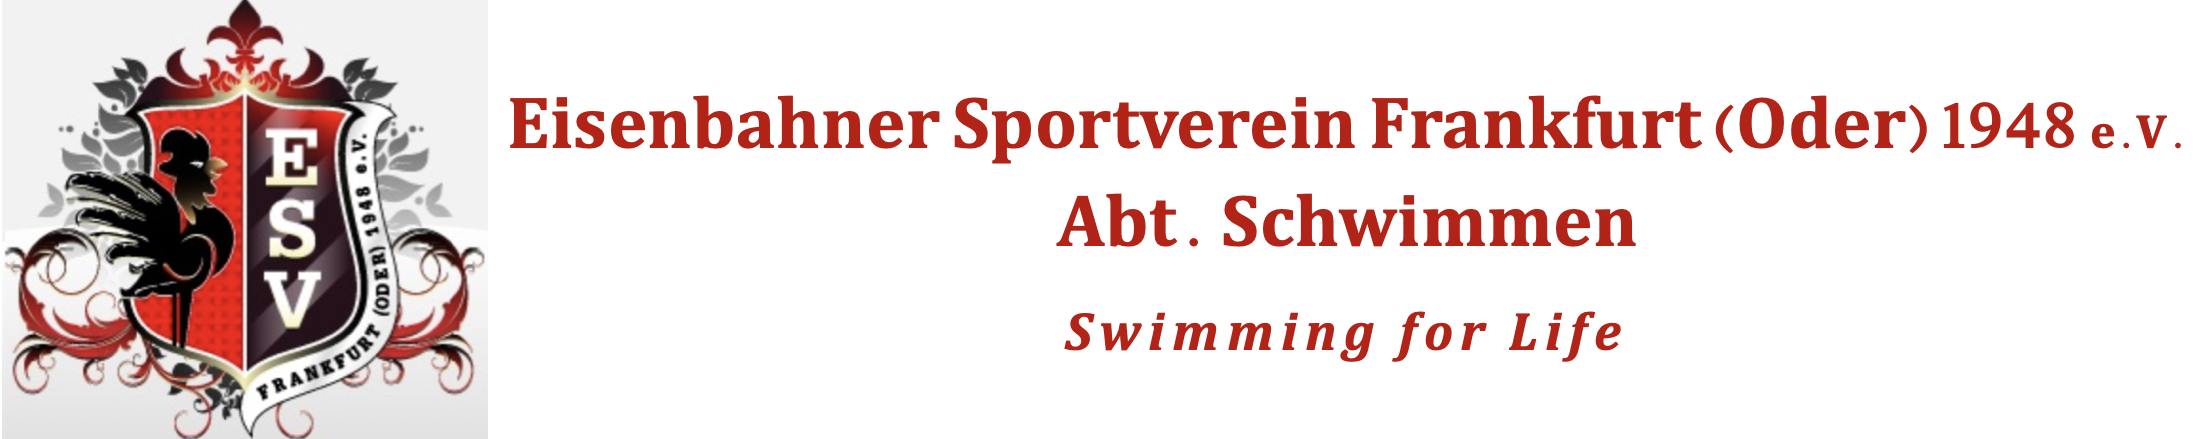 Eisenbahner Sportverein Frankfurt (Oder) 1948 e.V. – Abt. Schwimmen